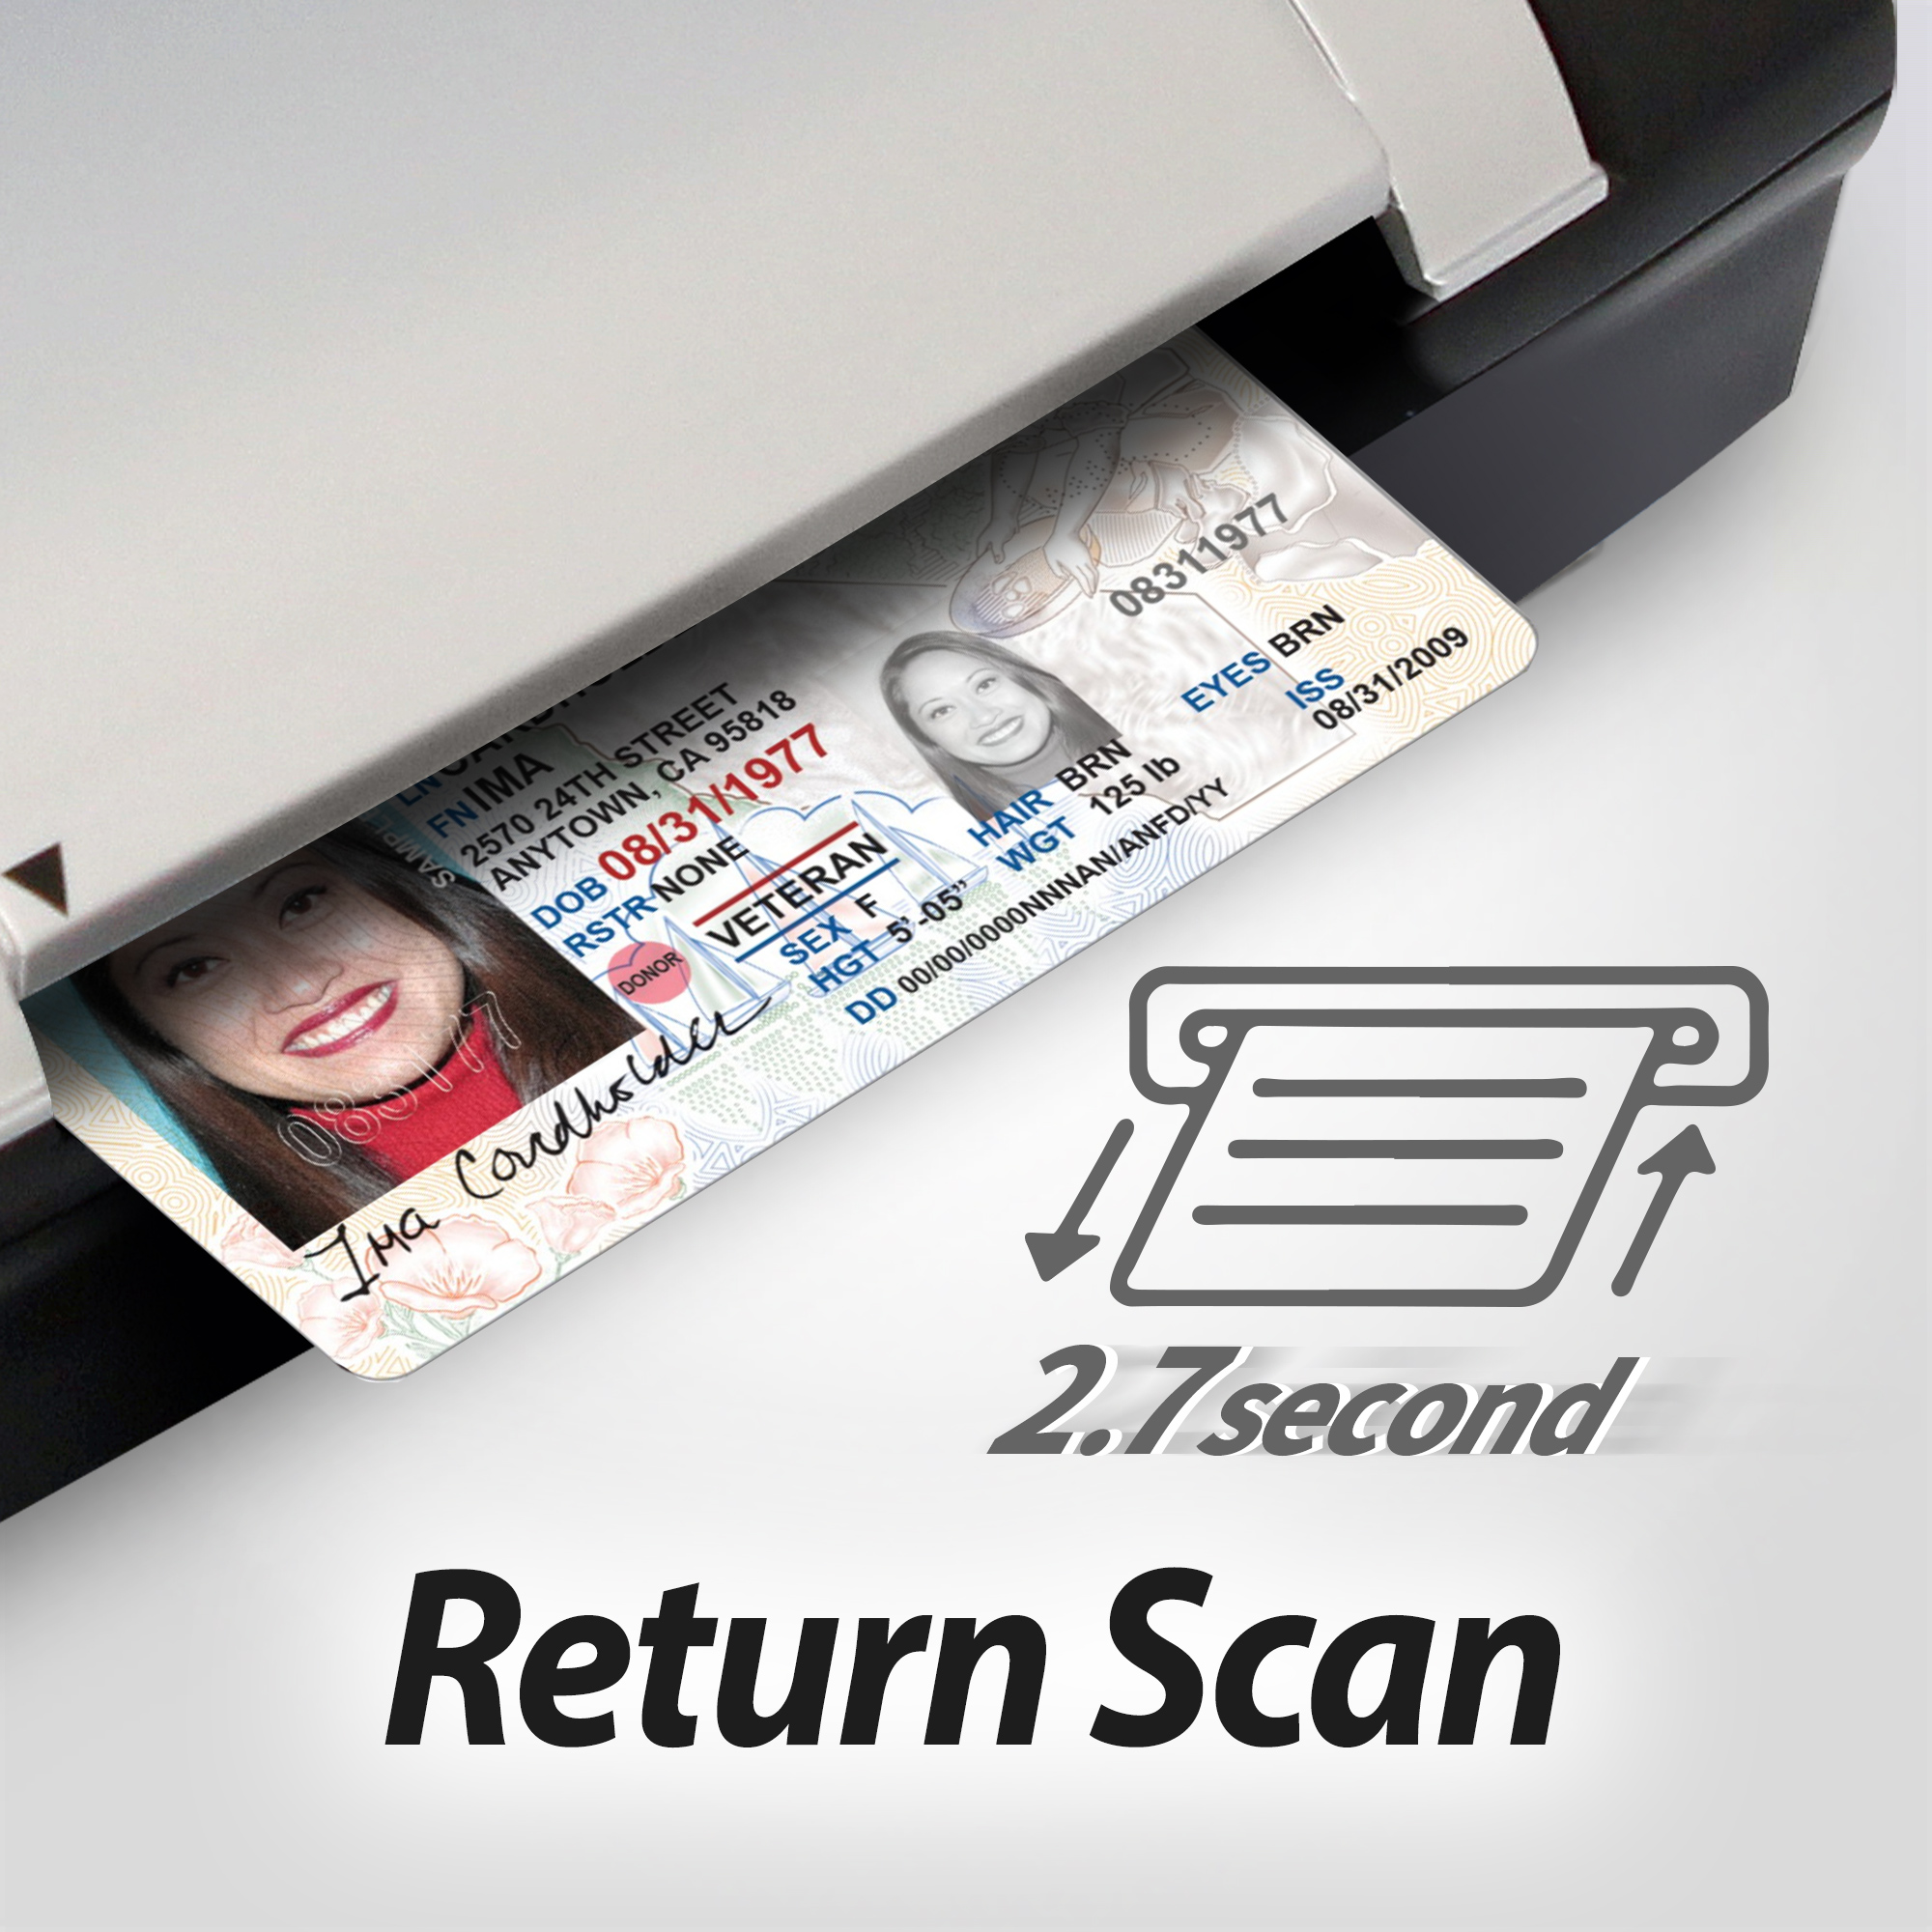 Return ID cards after scanning